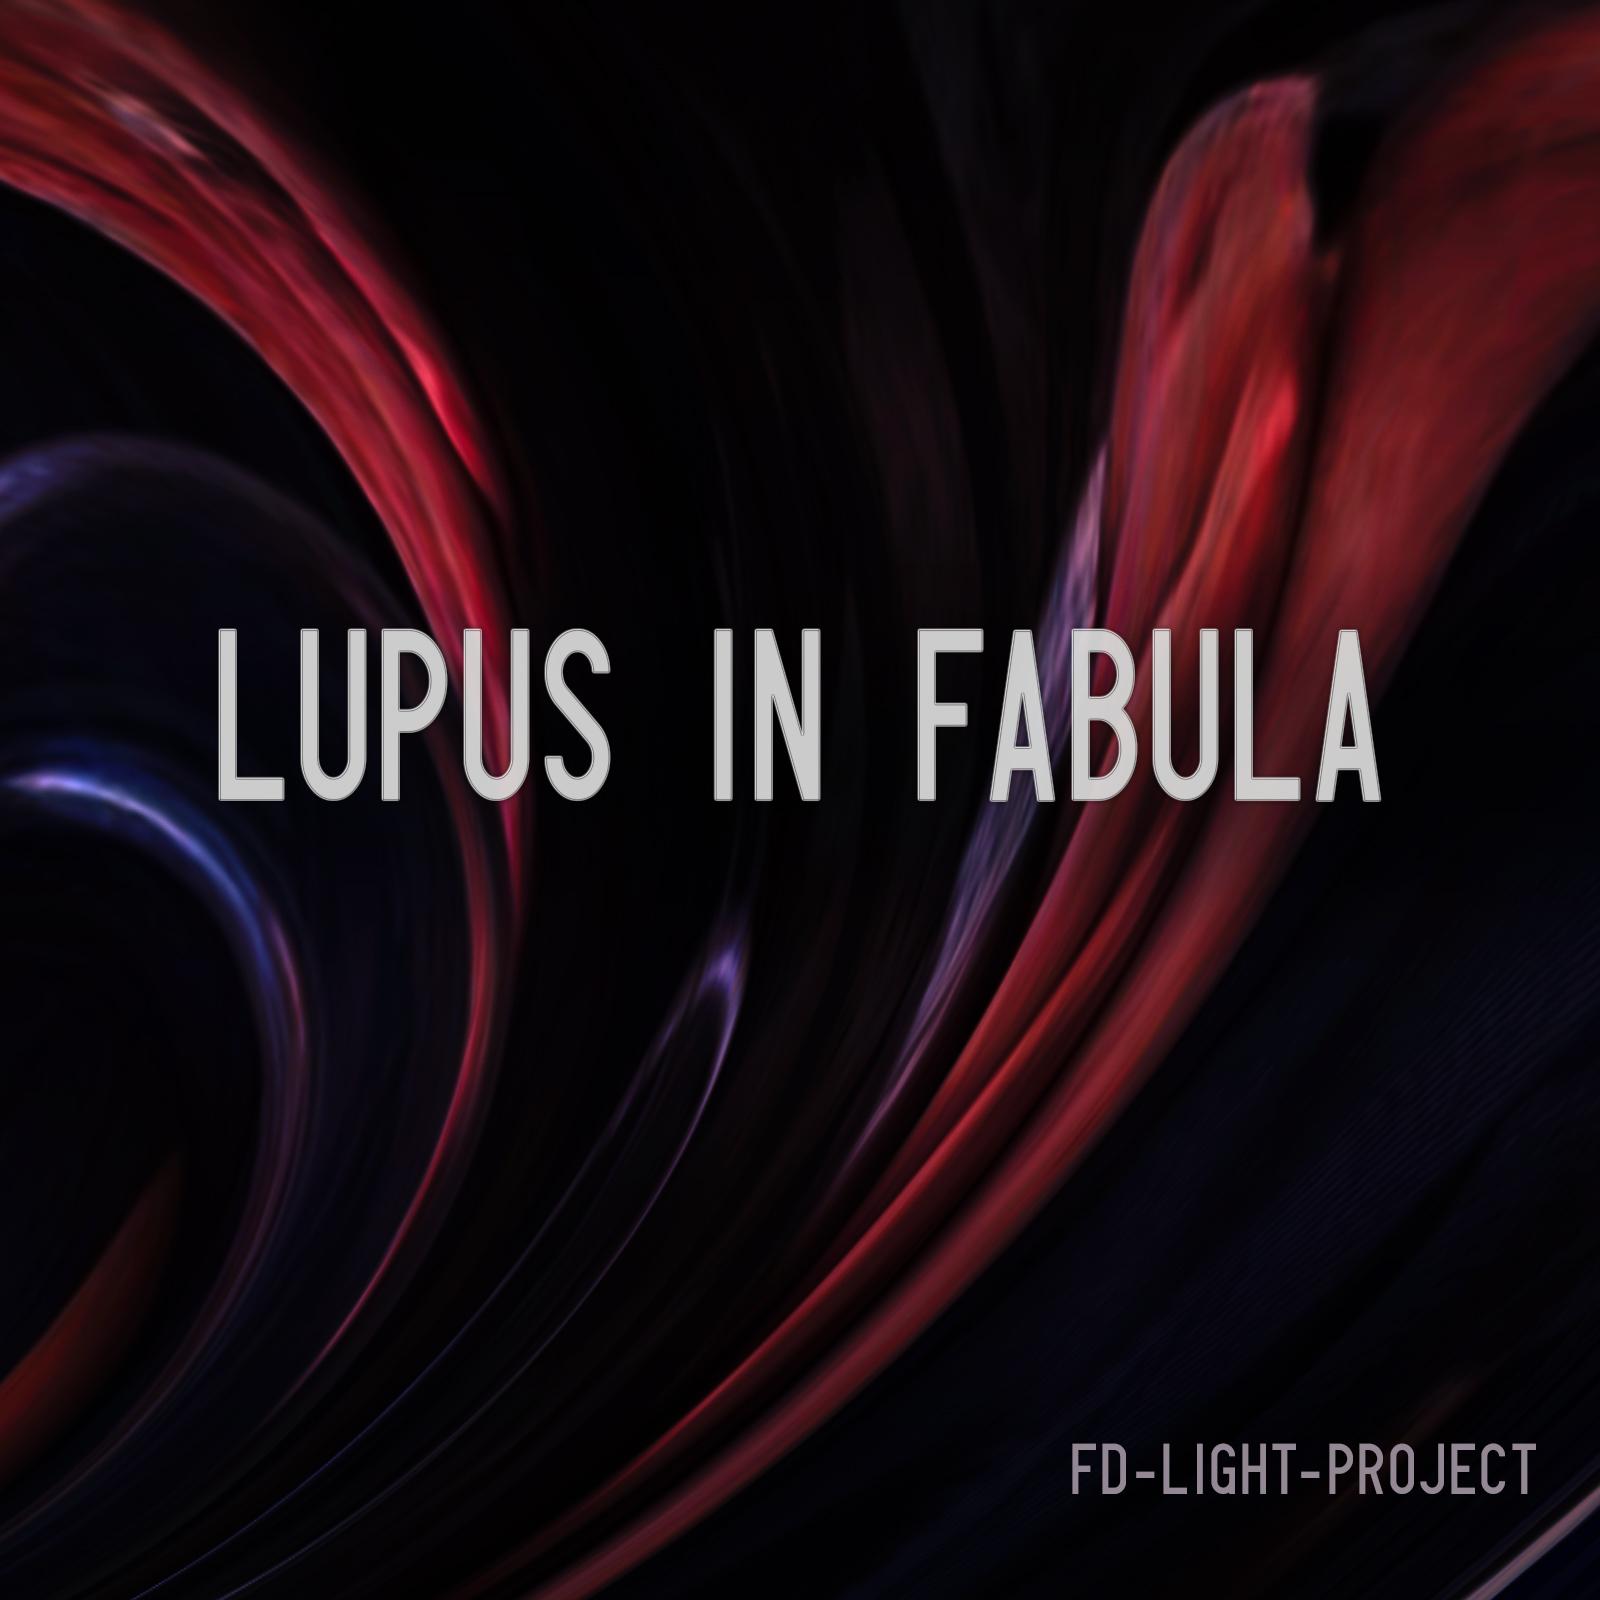 lupus in fabula music fd-light-project